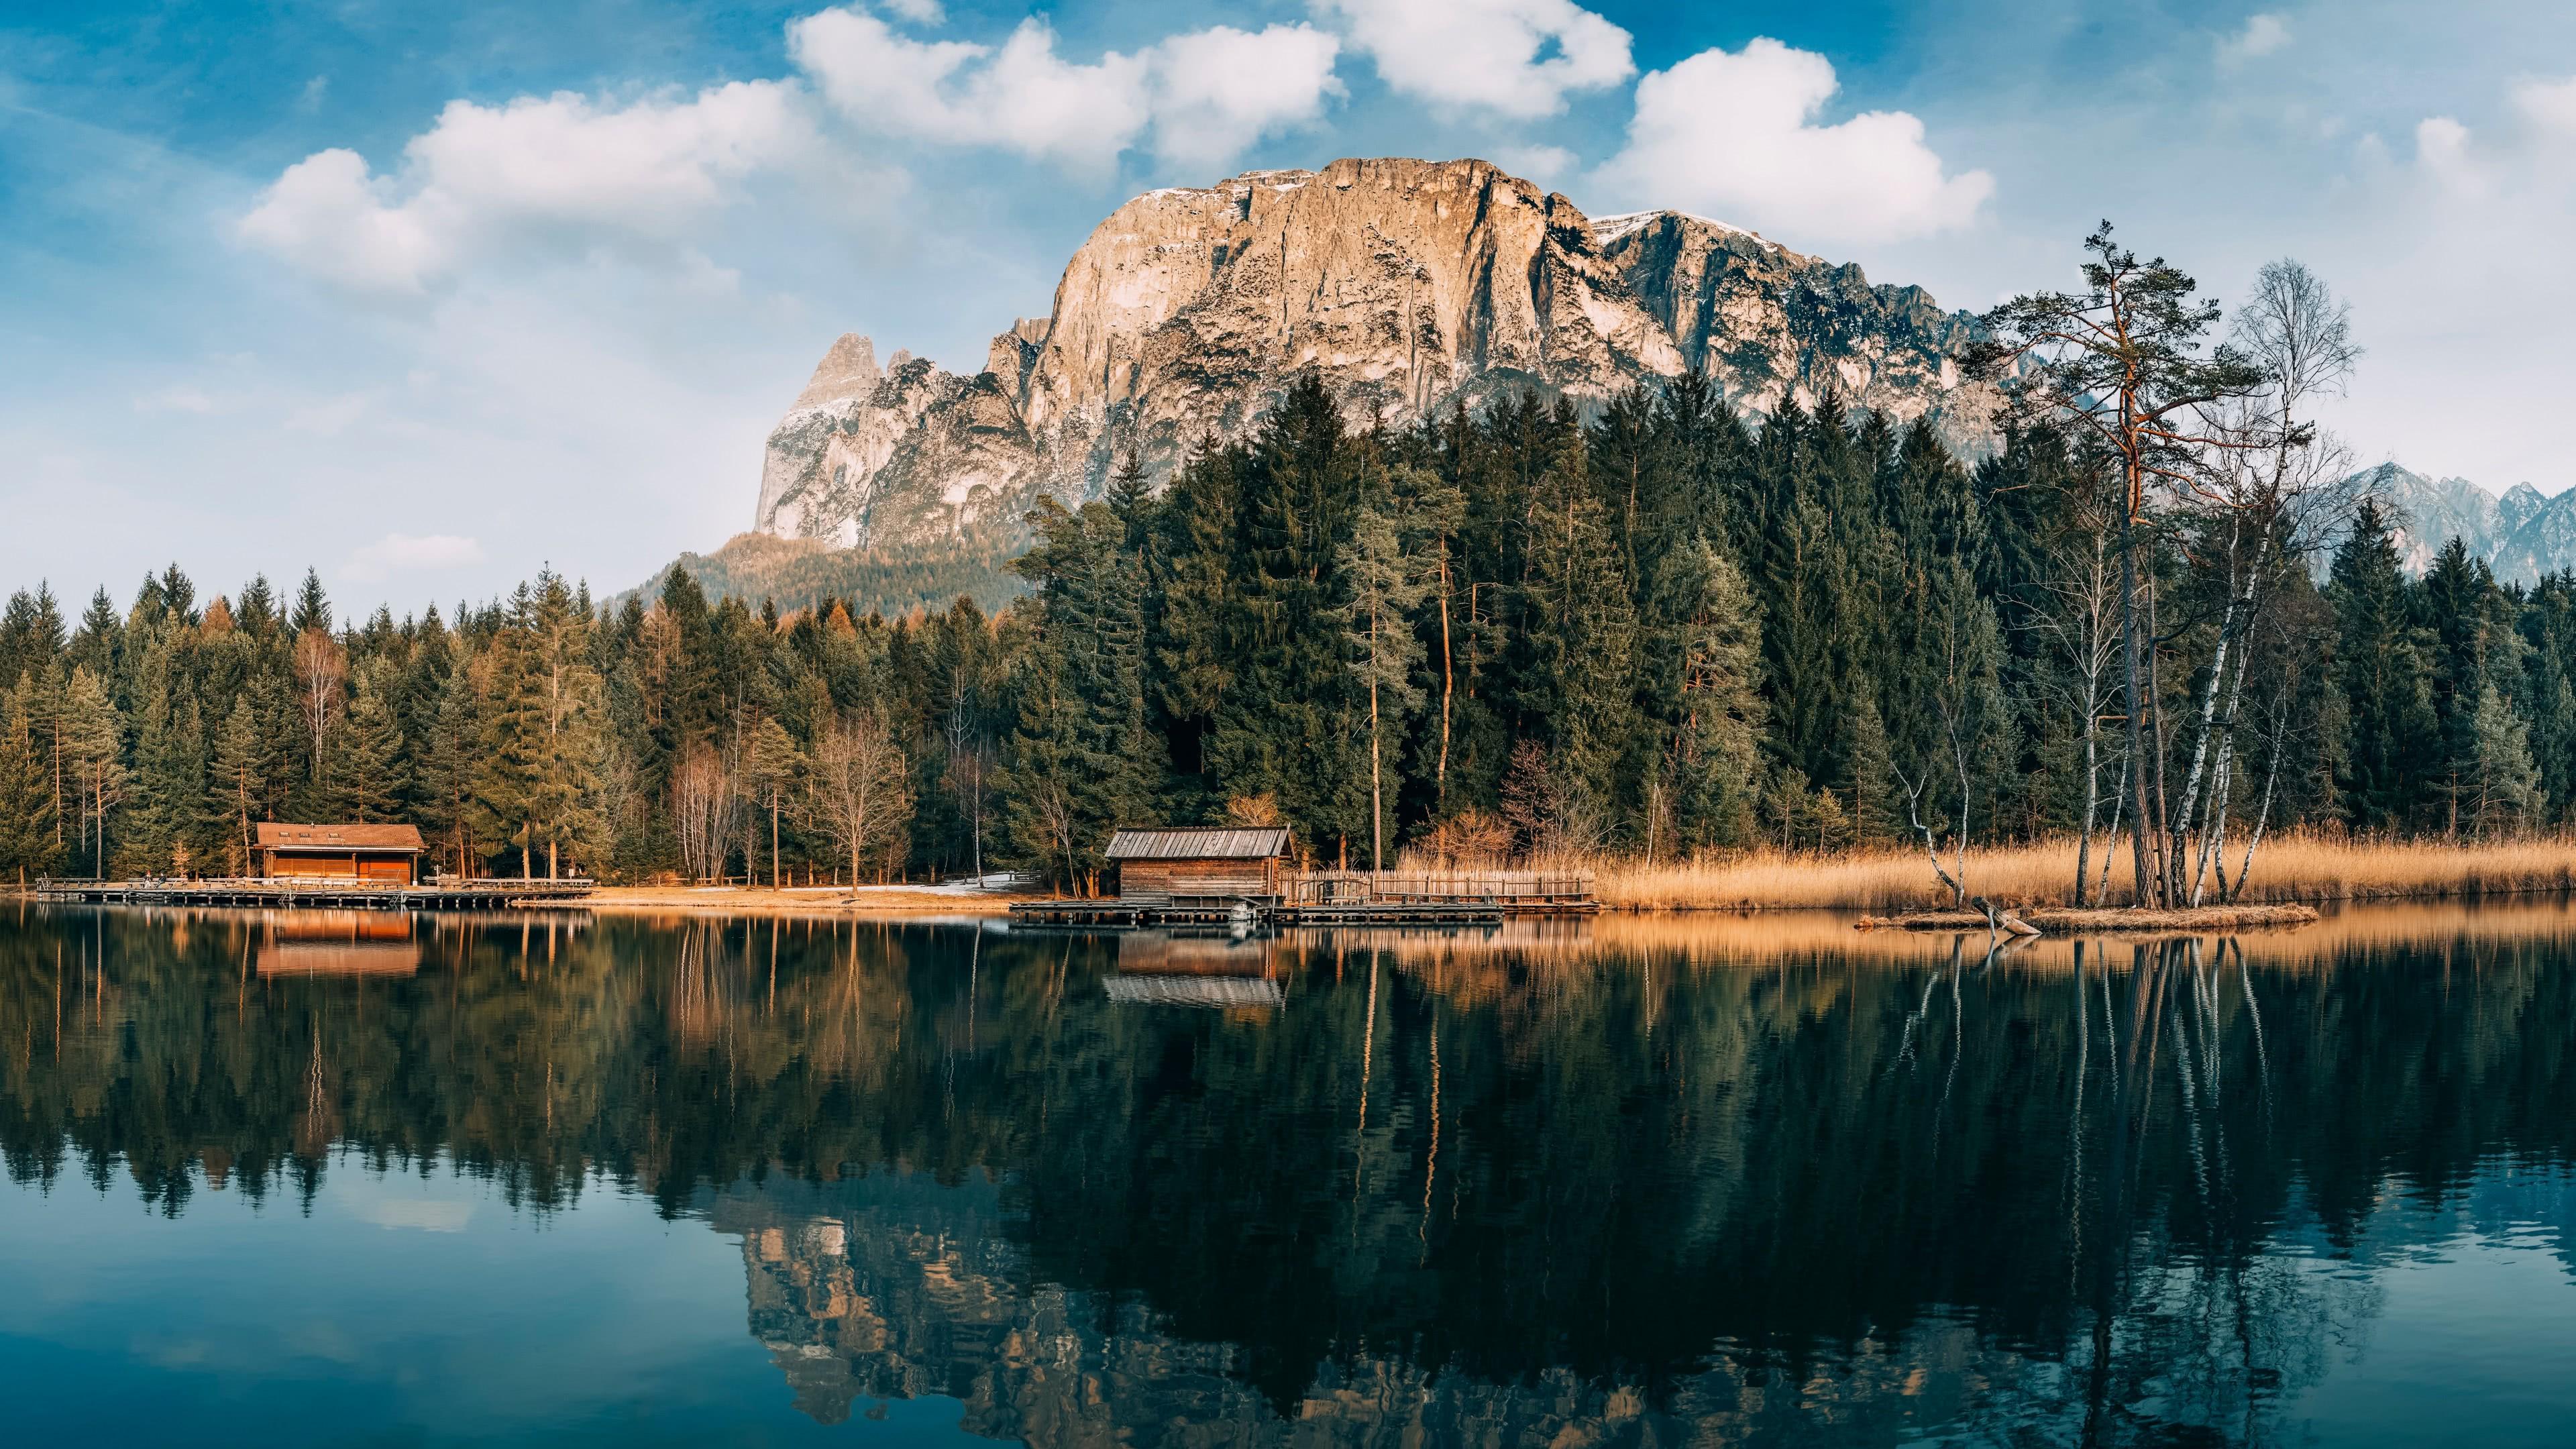 Forest Lake Cabin Landscape Uhd 4k Wallpaper Pixelz